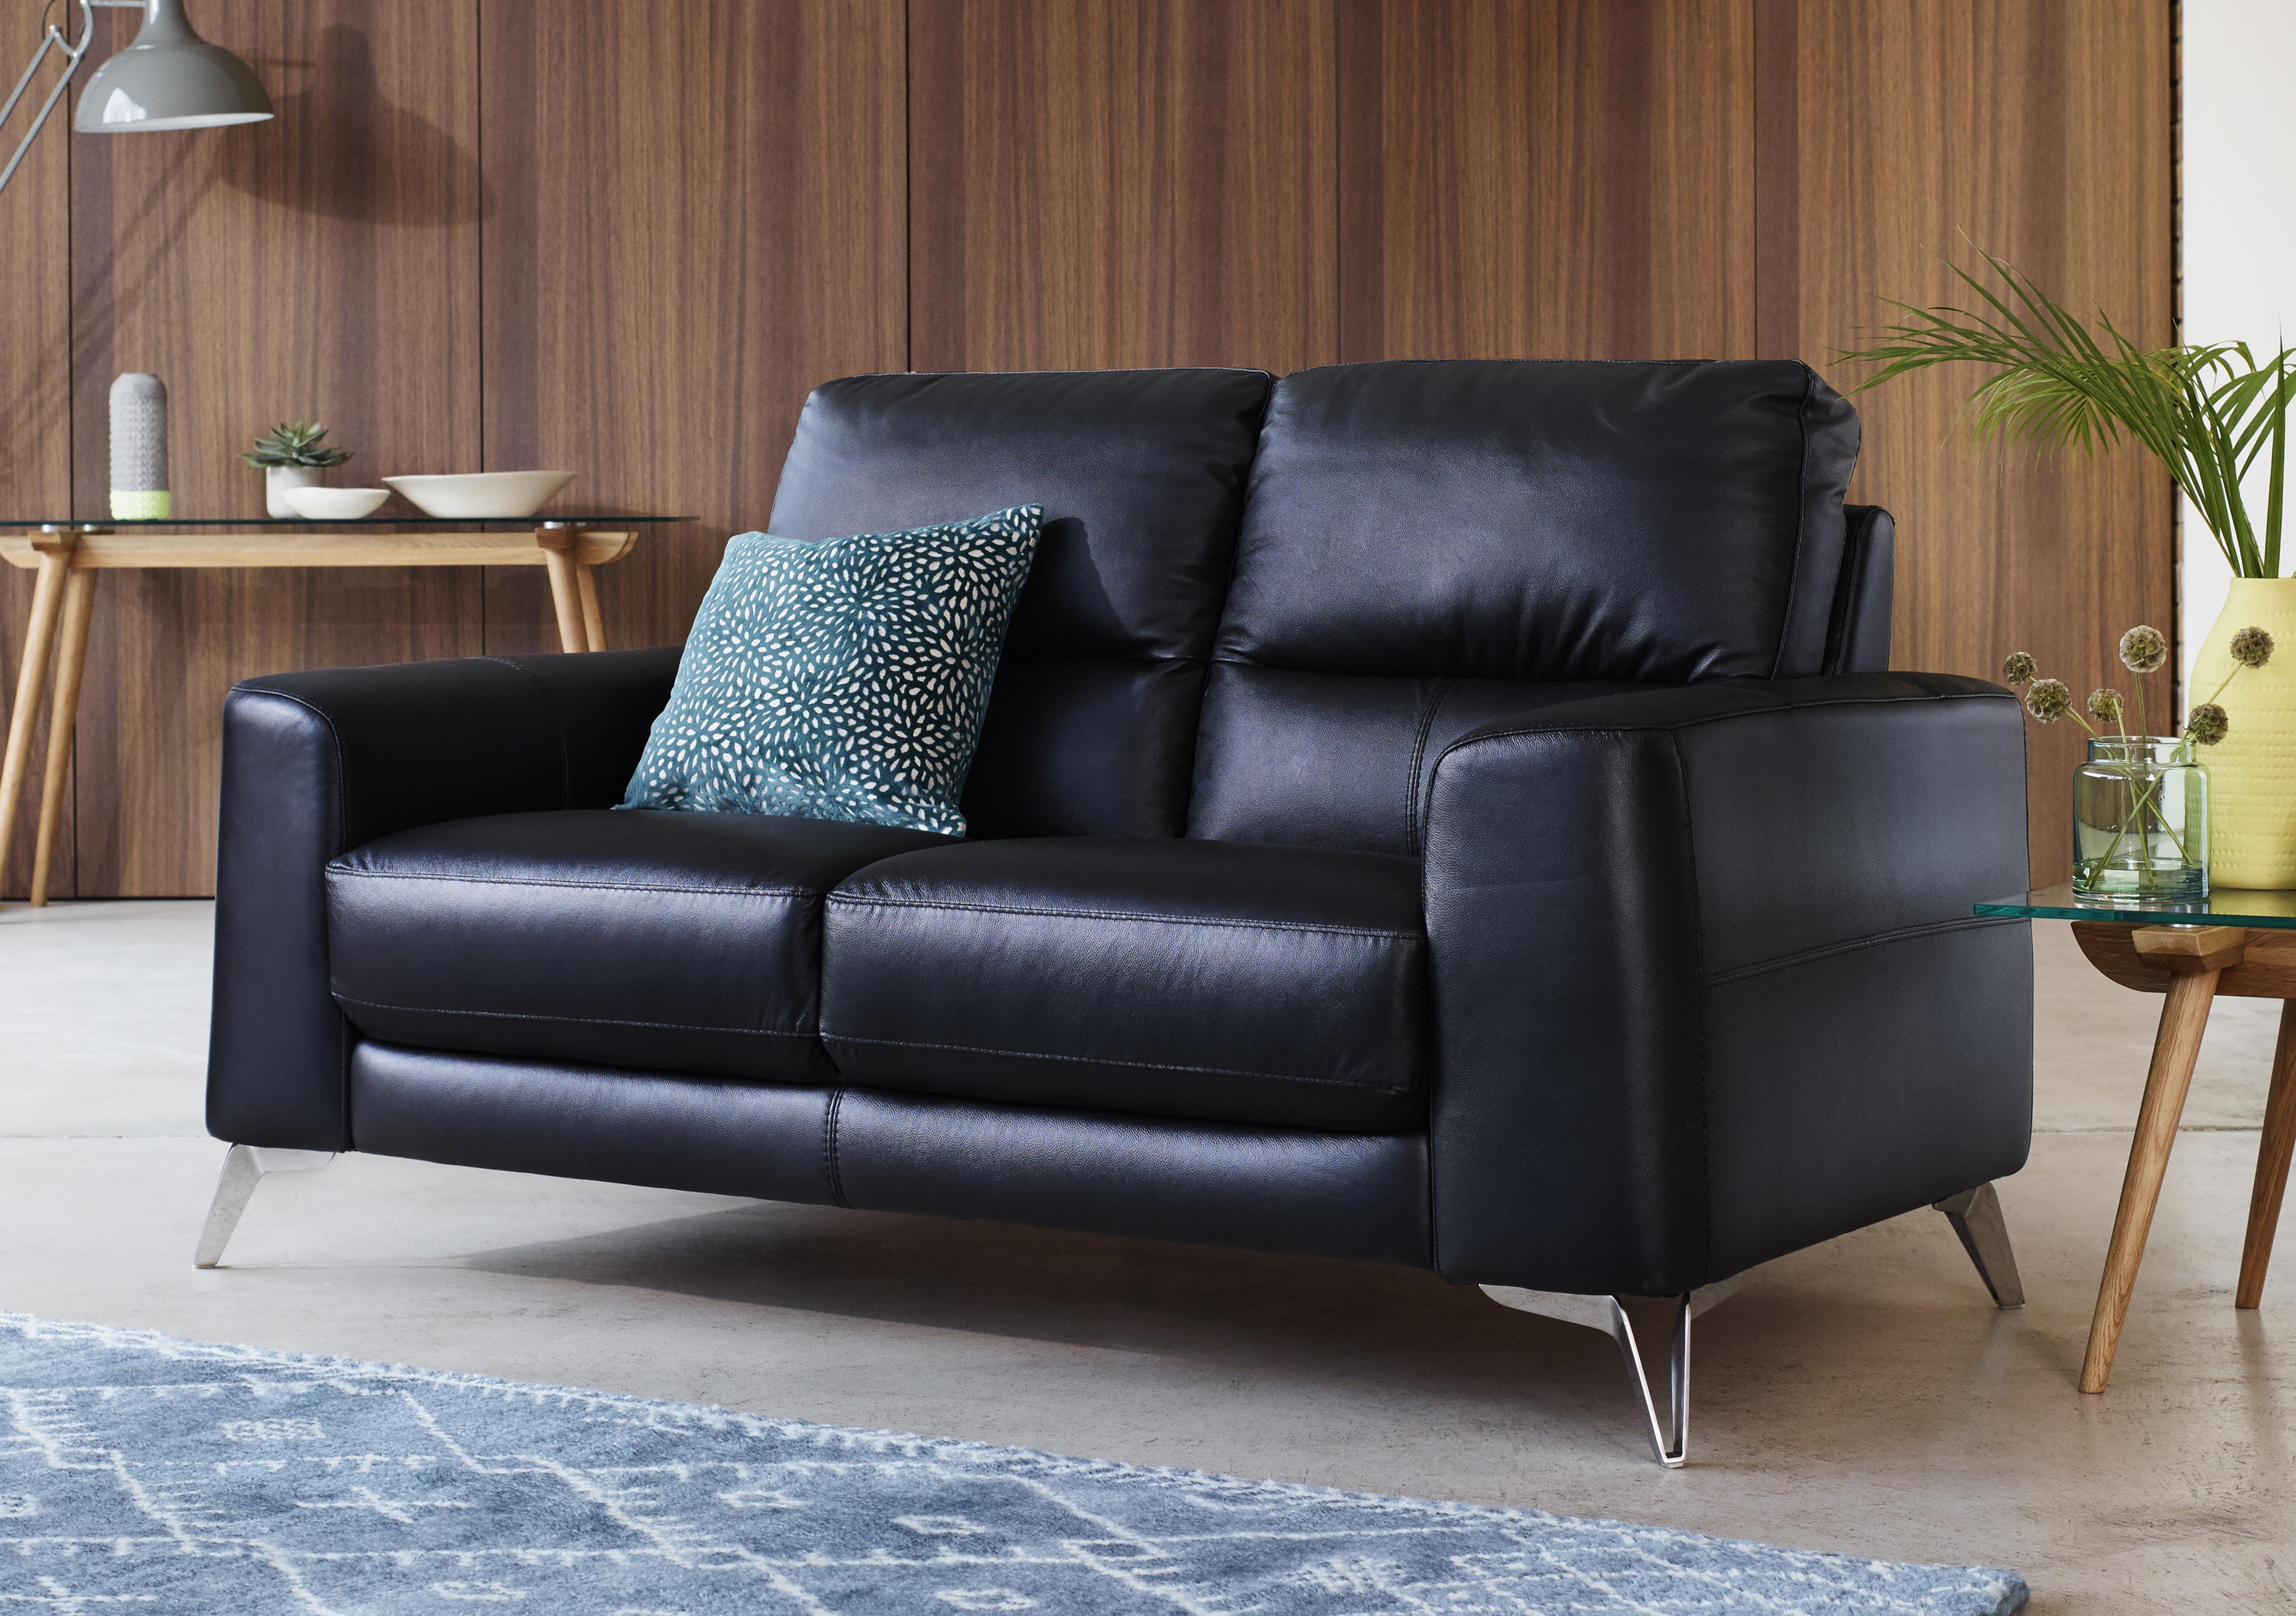 Save £100. Enzo 2 Seater Leather Sofa